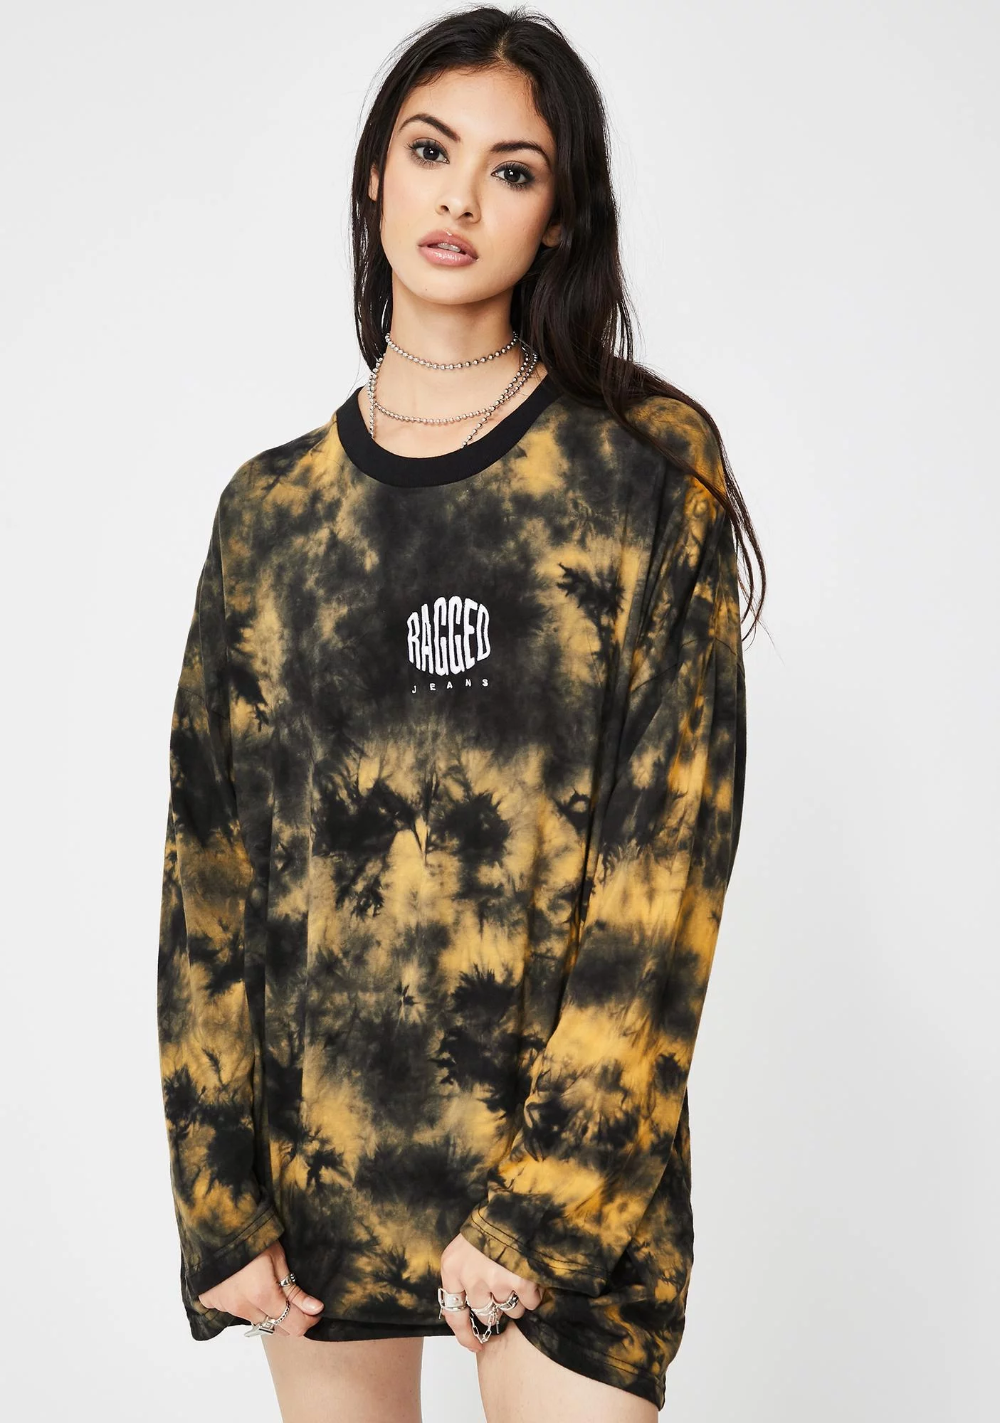 Mens Long Sleeve Crew Neck T-shirt Tie Dye Printed Winter Base Layers Tops Tee